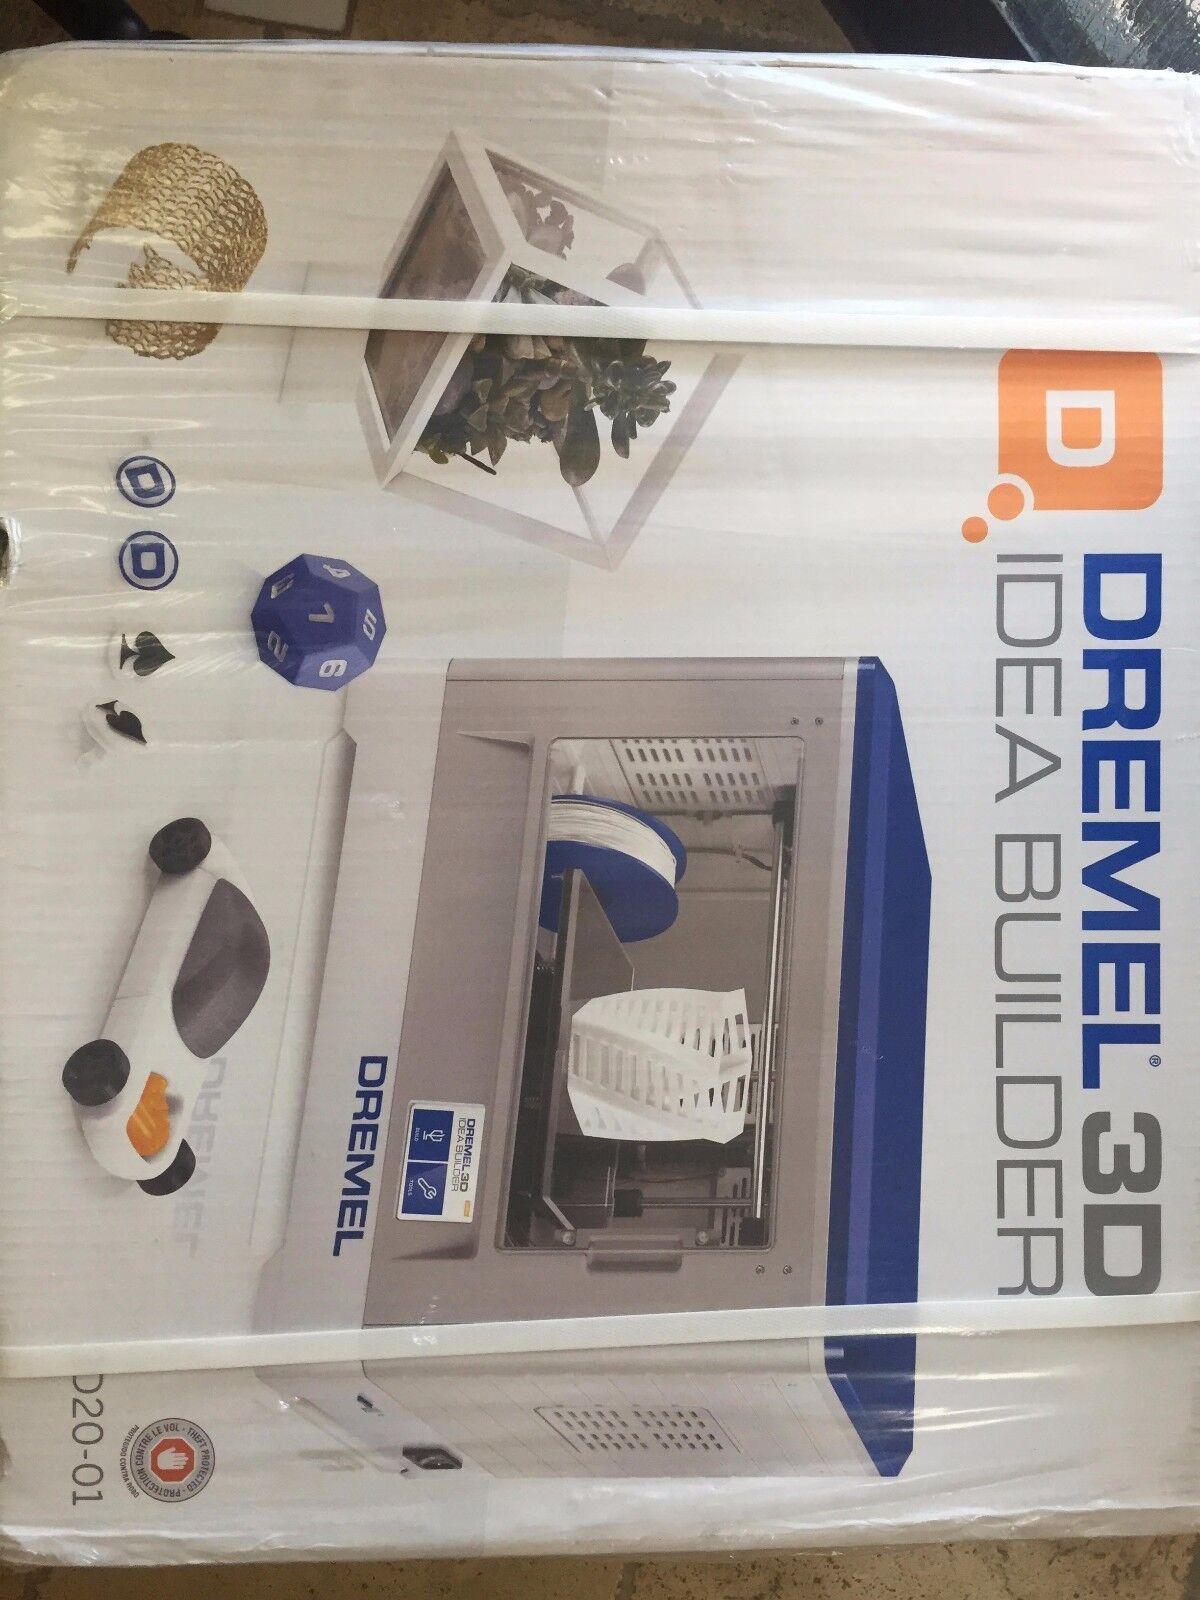 NEW Dremel DigiLab 3D20 3D Printer, Idea Builder for Tinkere